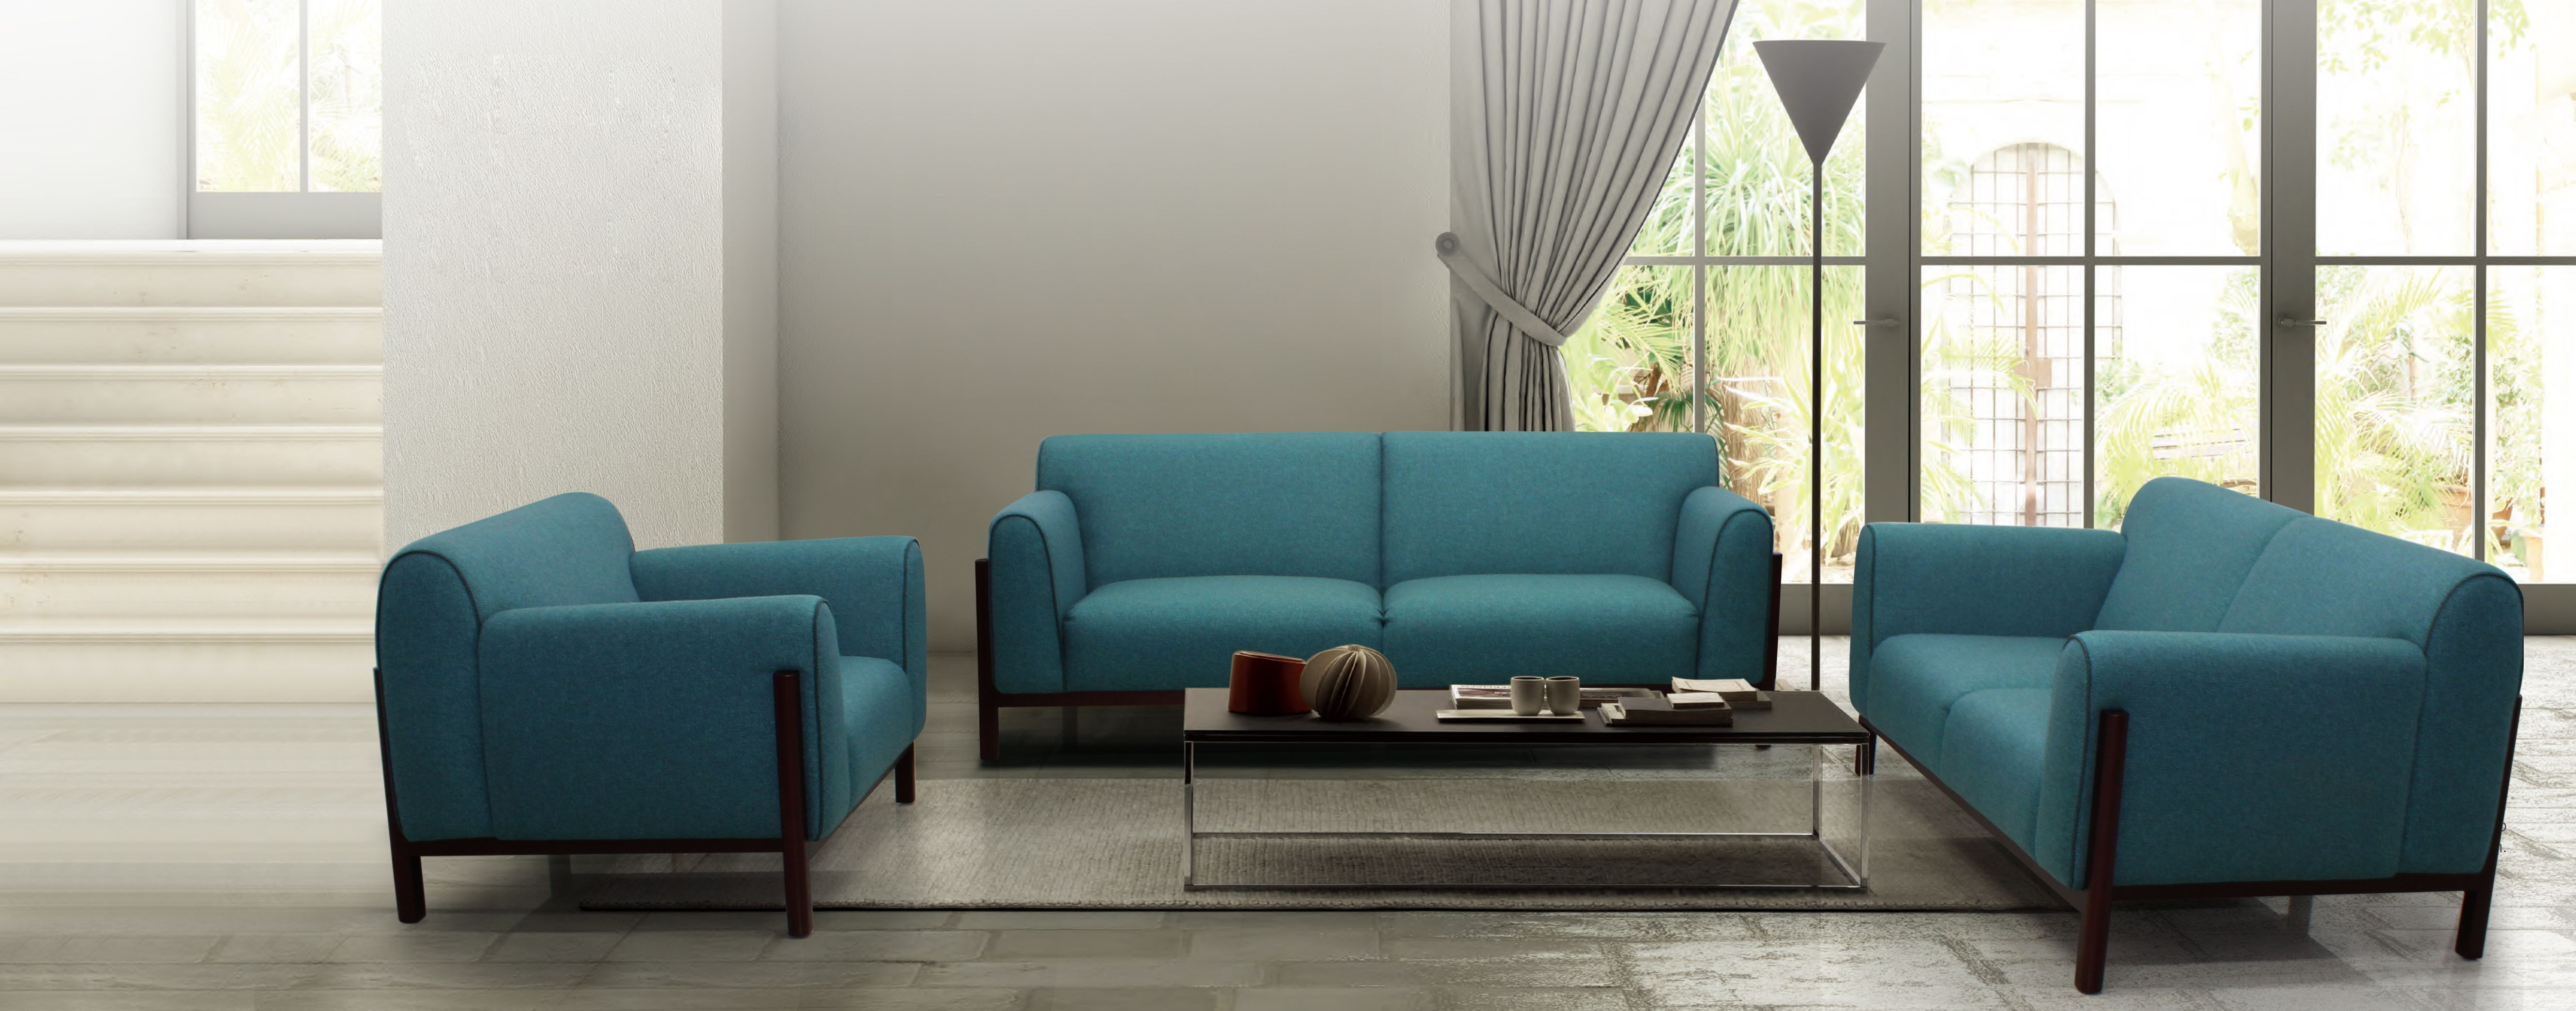 Meiko Refurbished And Transform Penang Malaysia U Shaped Sofa Hall Sofa L Shaped Sofa